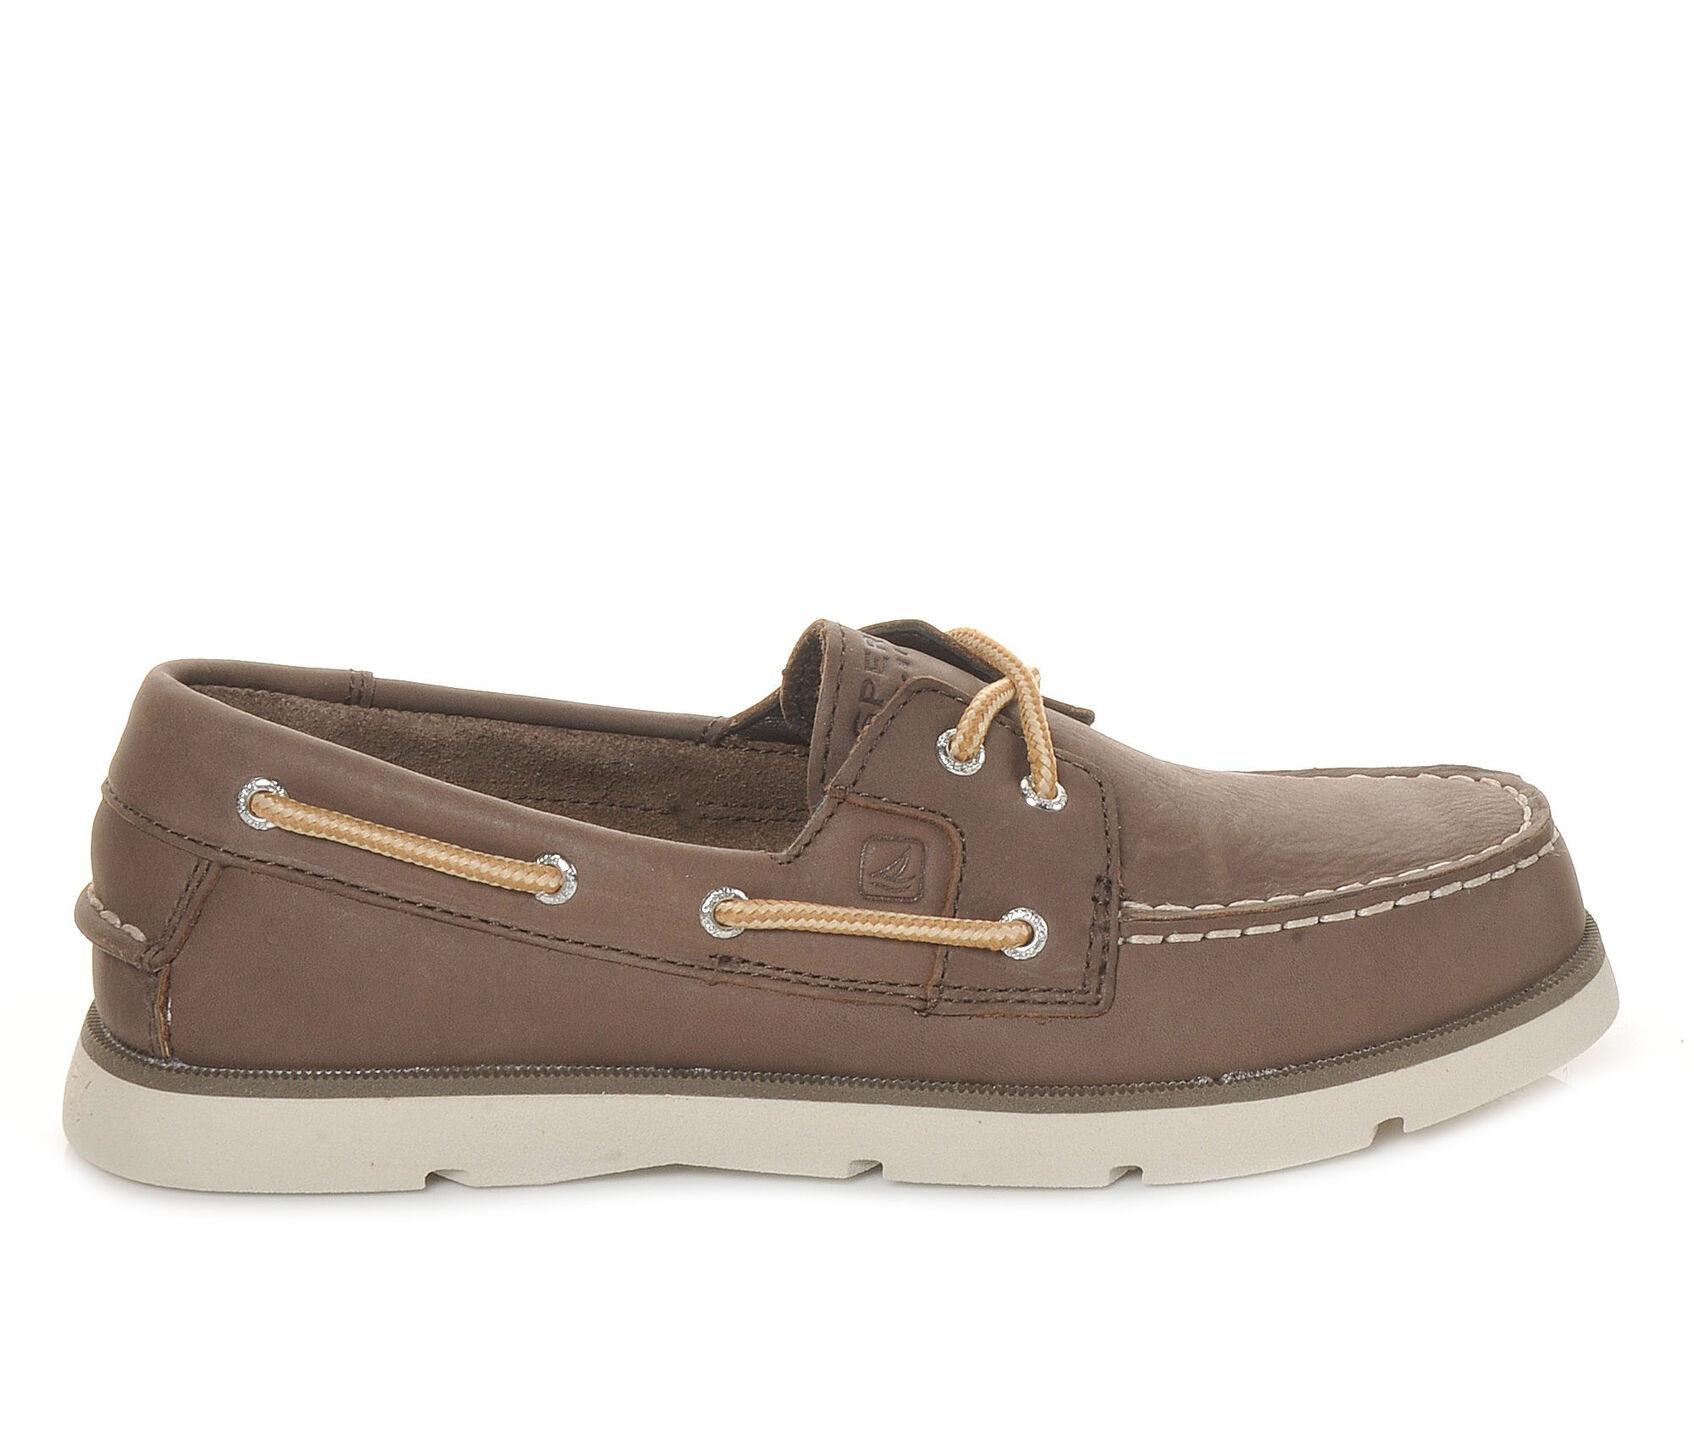 8edbcdd0775 Boys  Sperry Little Kid   Big Kid Leeward Boat Shoes